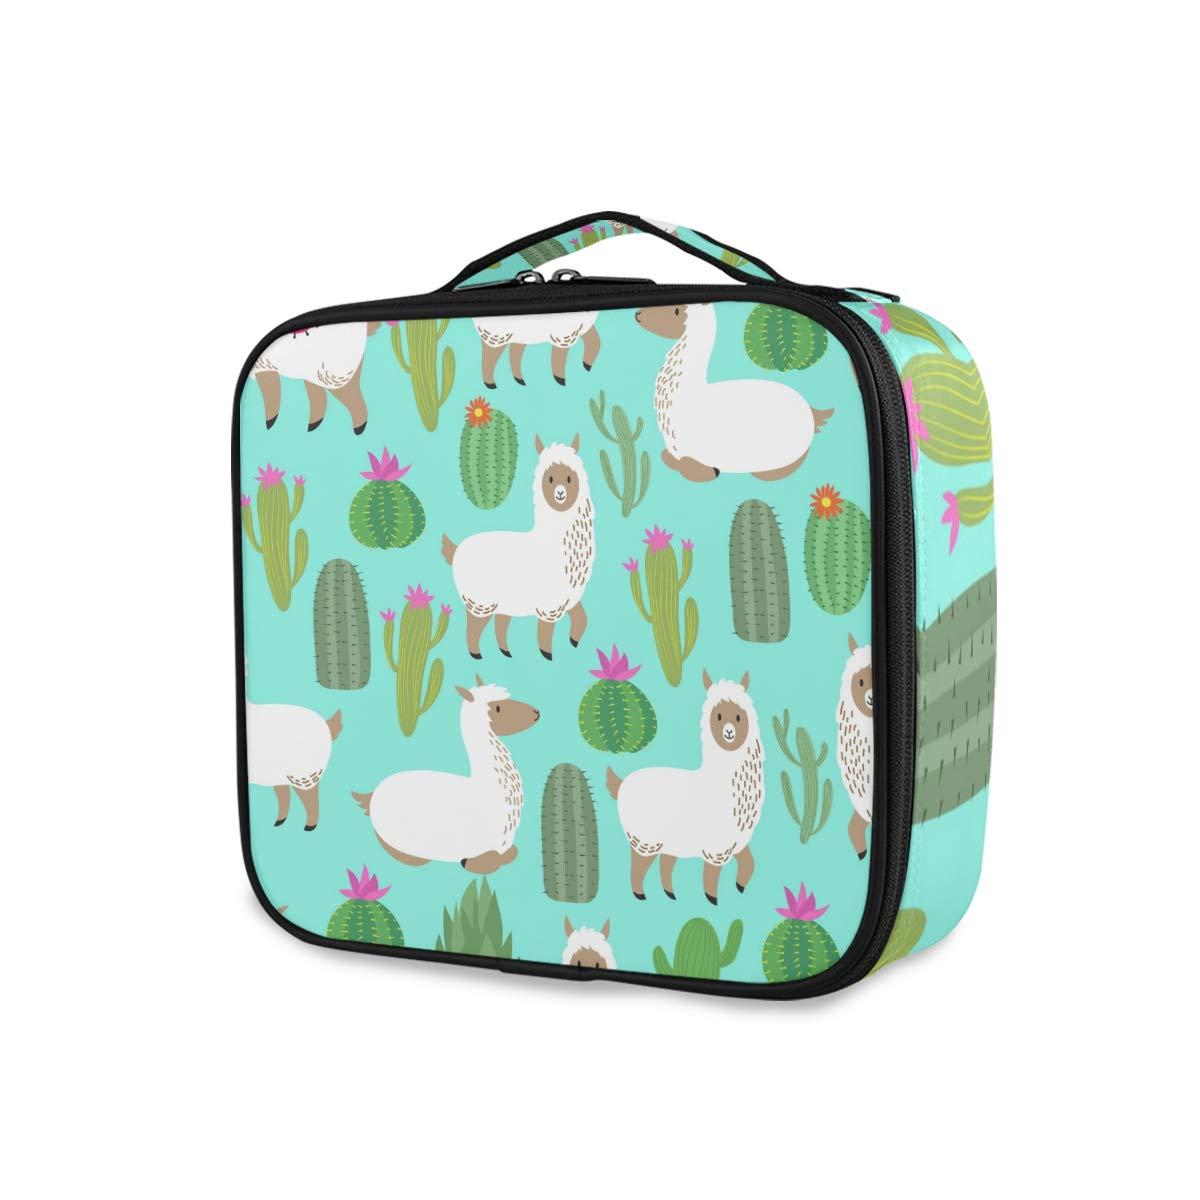 Travel Makeup Case Llamas Portable Bag Elegant Ranking TOP17 Cosmetic Ca Train